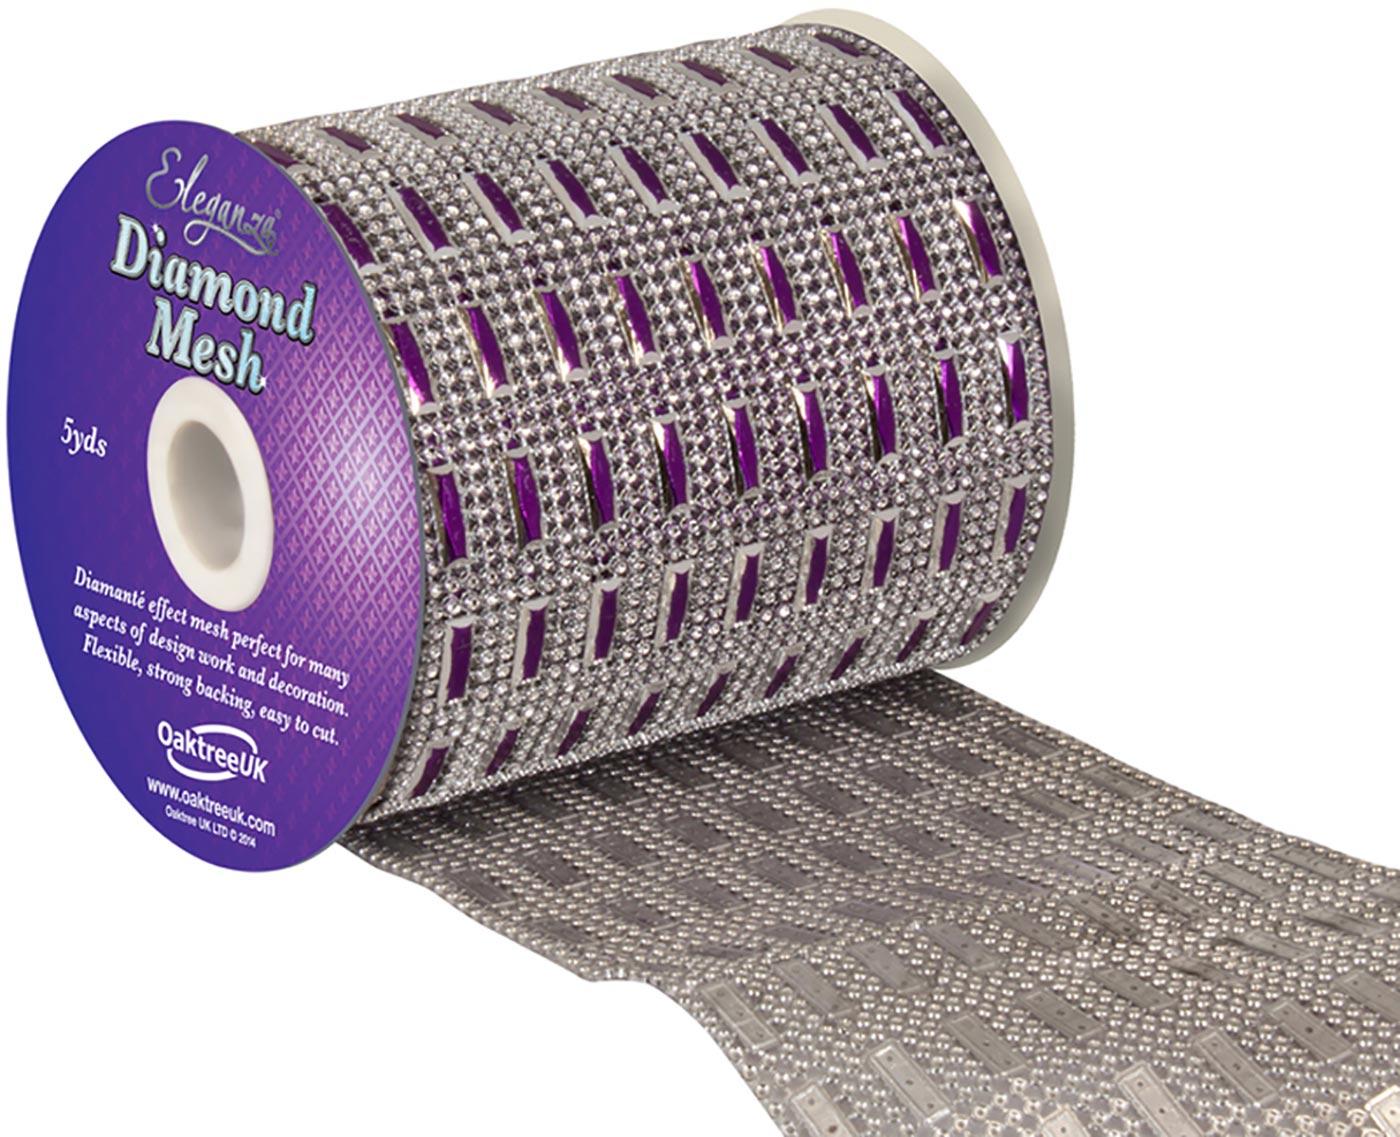 Eleganza Diamond Mesh 11cm x 4.5m Pattern No.352 Purple